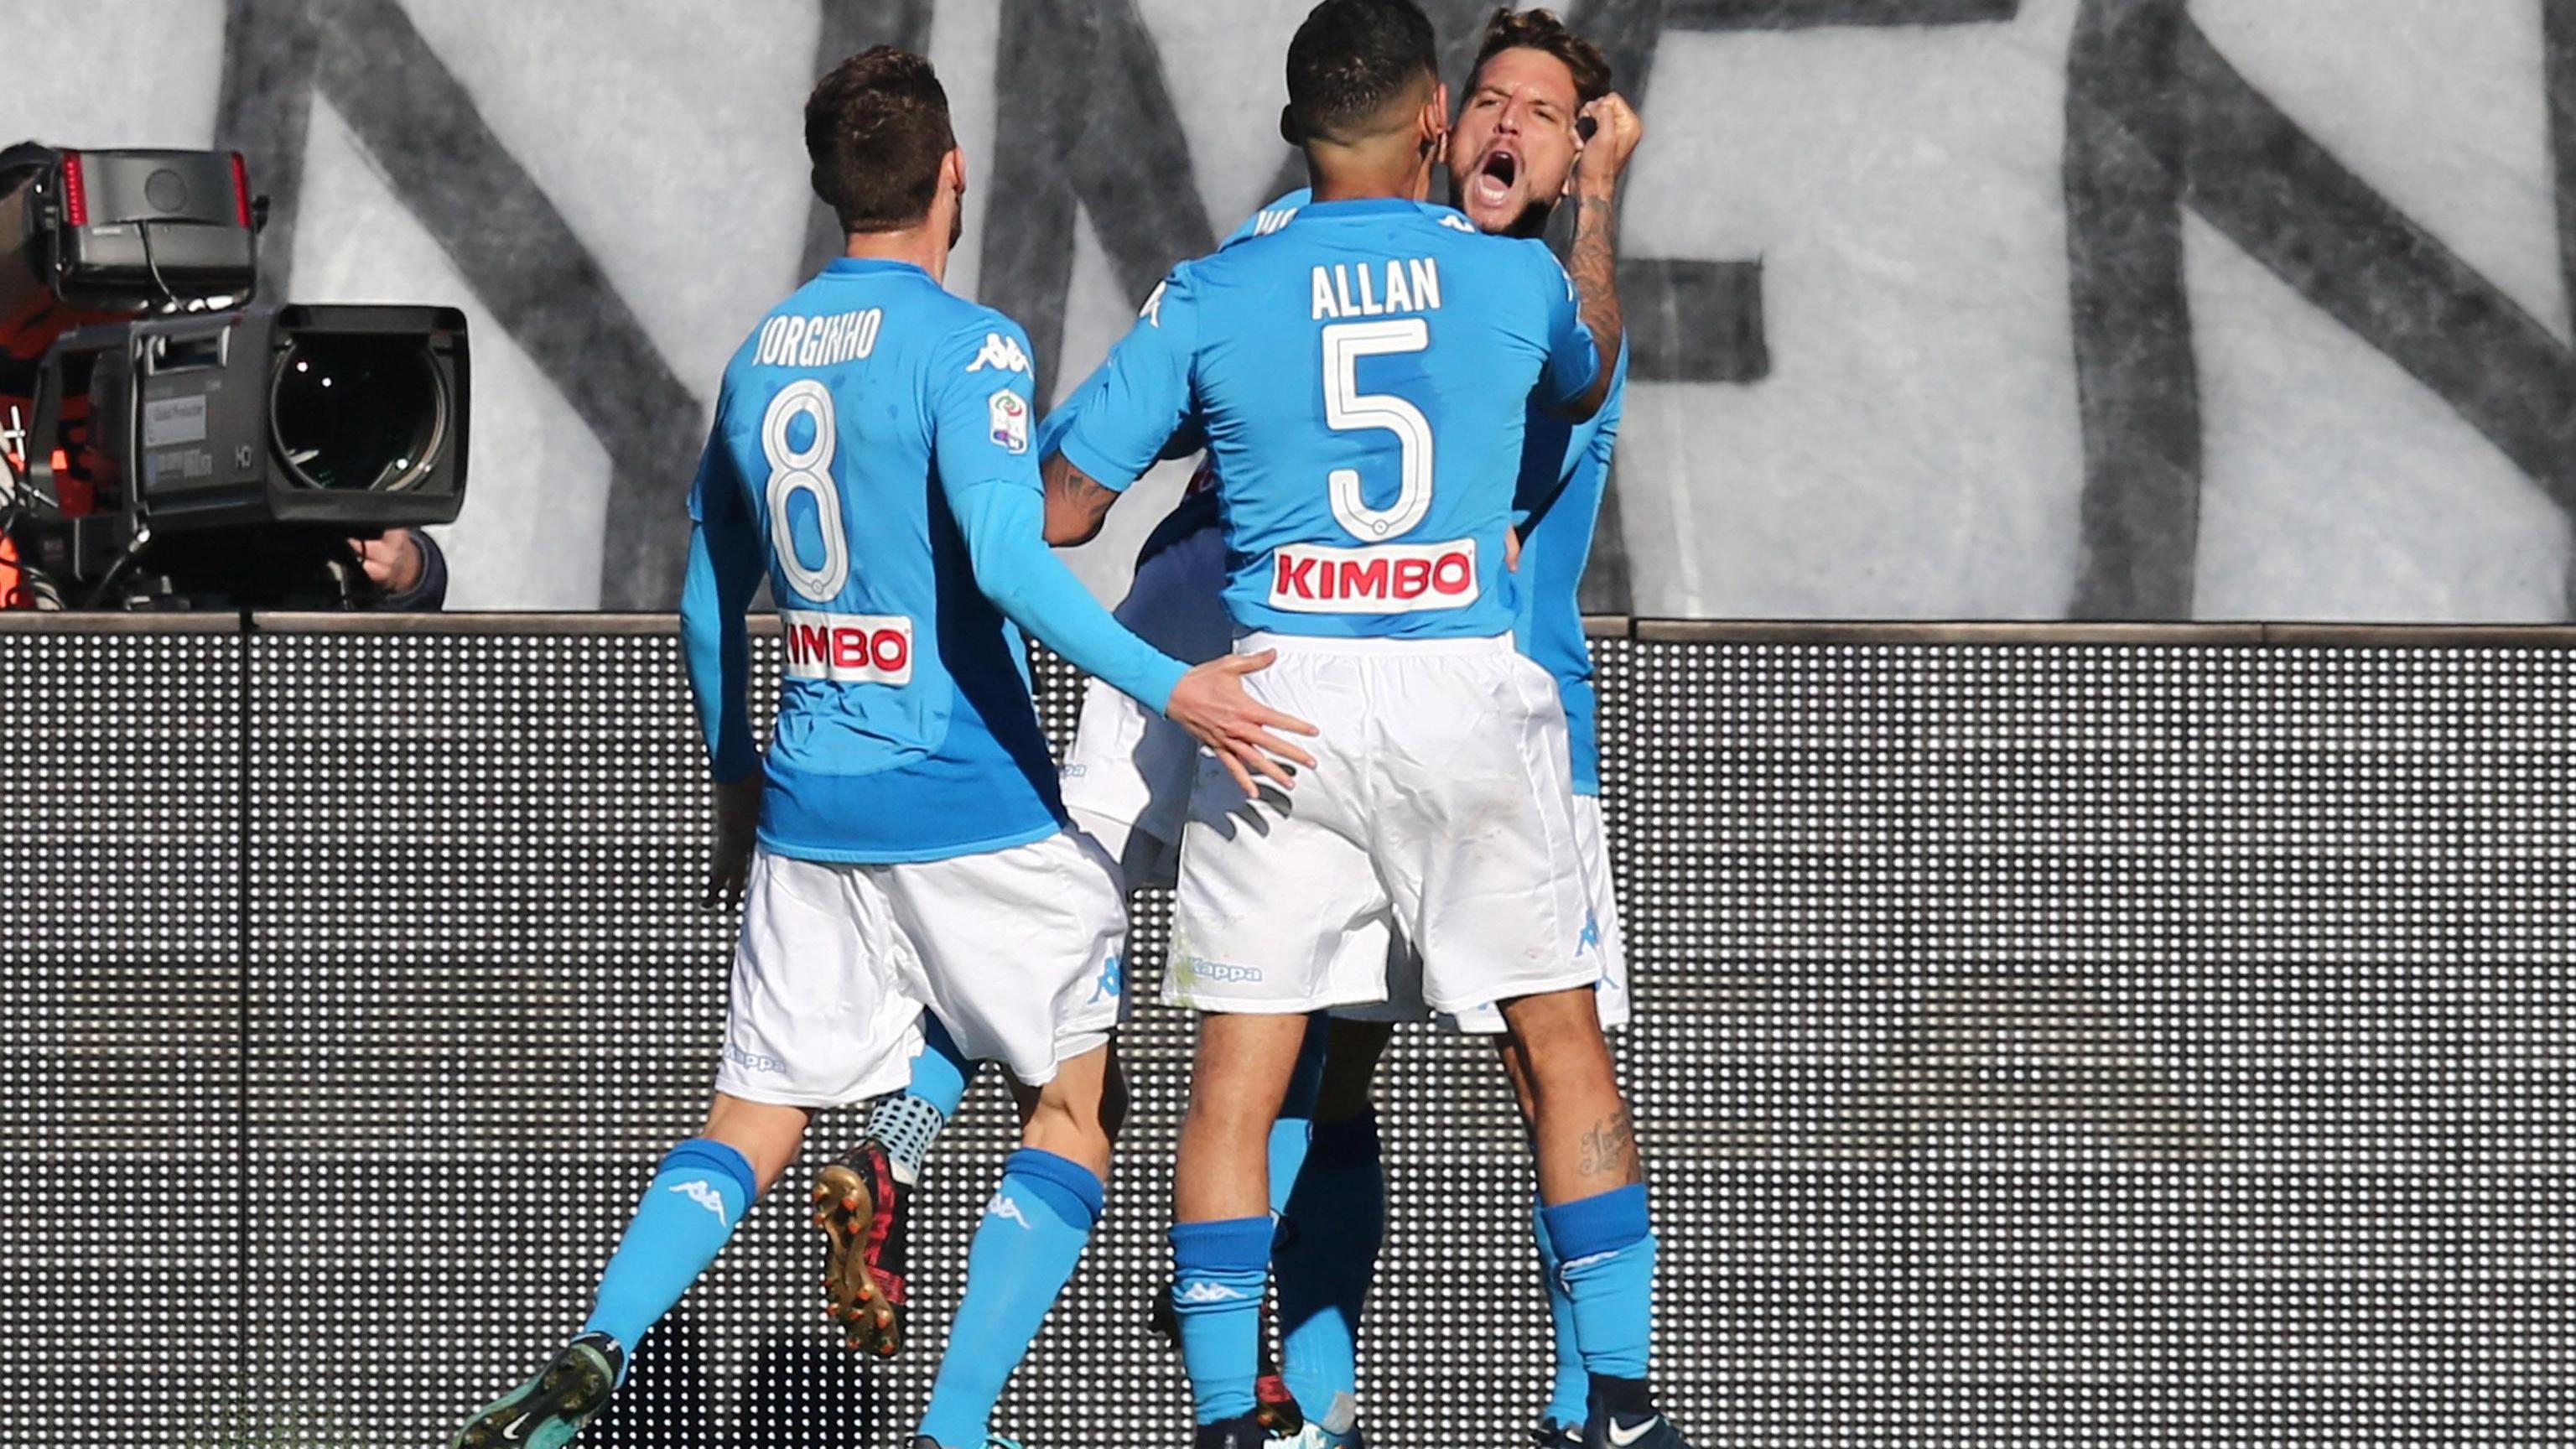 Serie A, Atalanta-Napoli 0-1, le pagelle